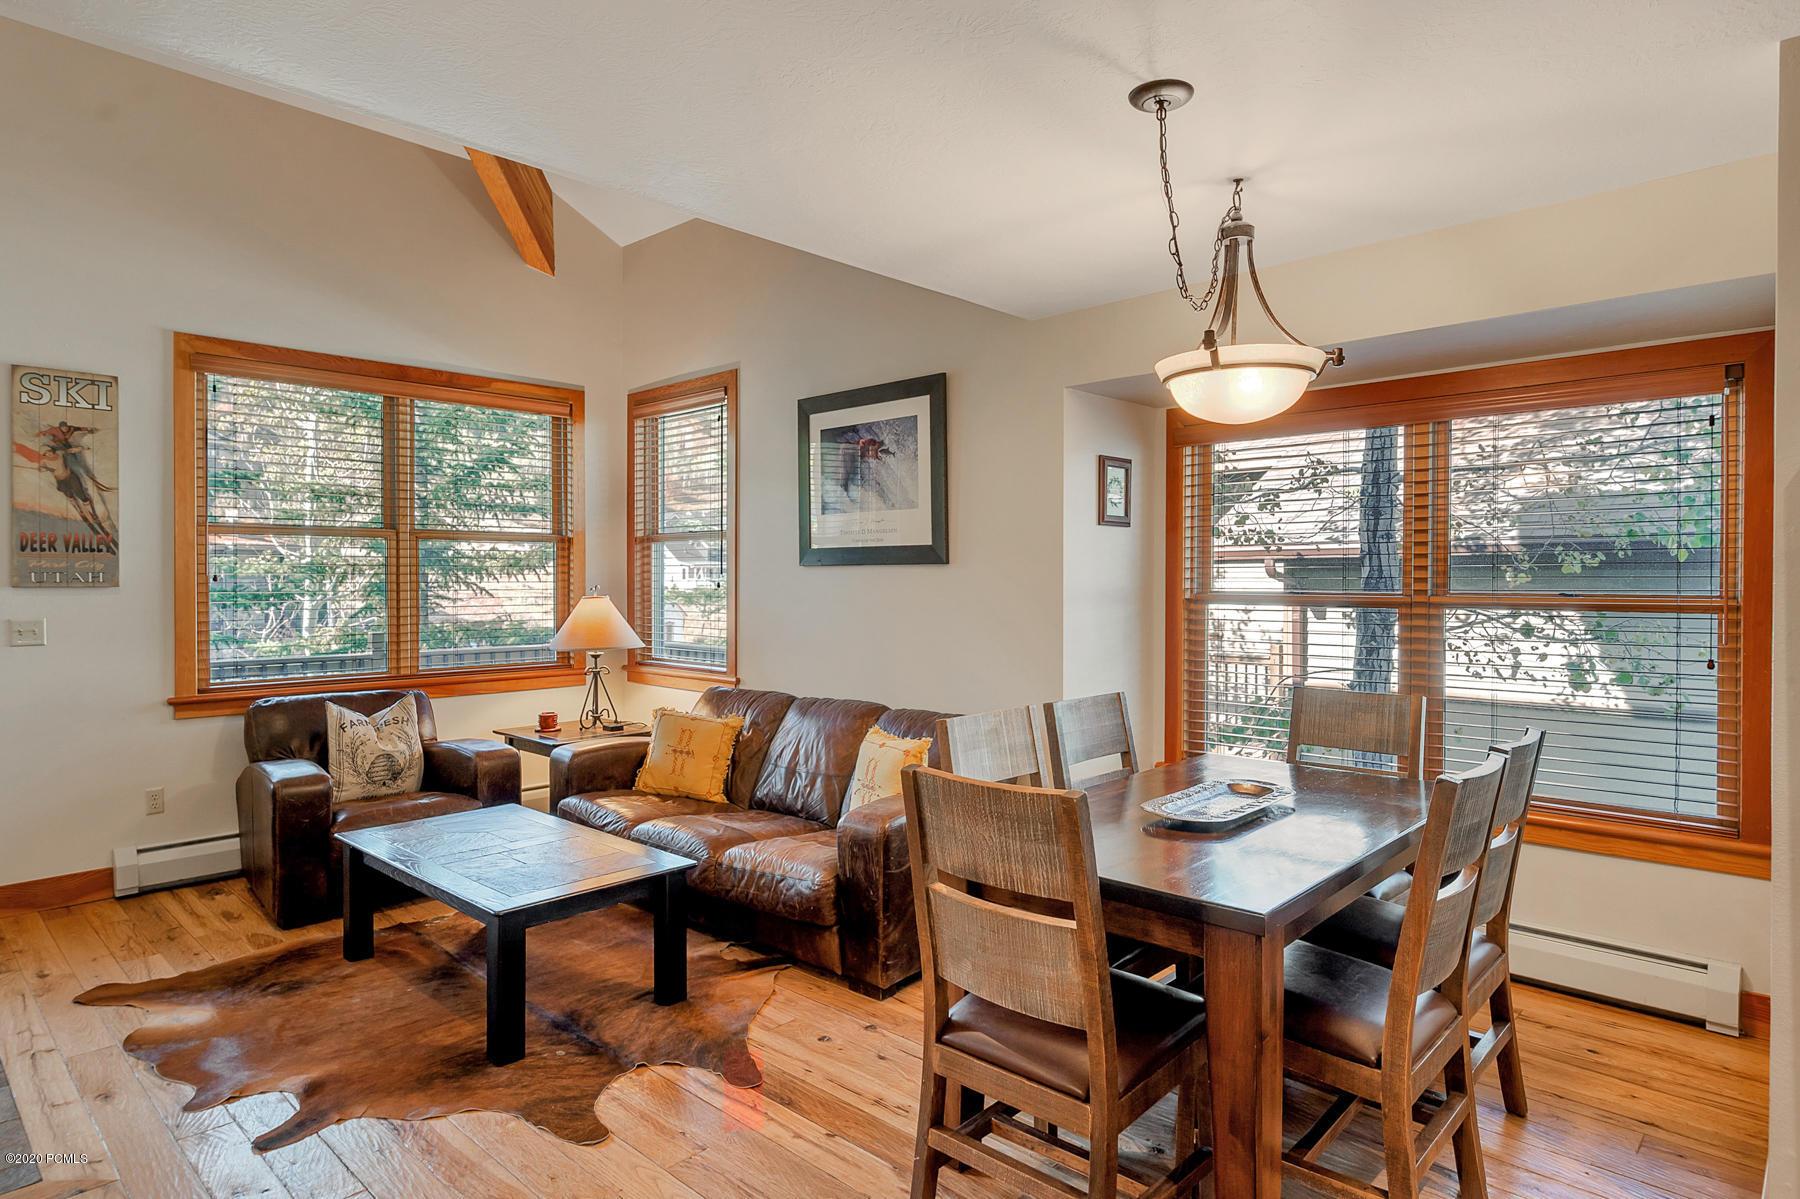 675 Deer Valley Drive, Park City, Utah 84060, 2 Bedrooms Bedrooms, ,3 BathroomsBathrooms,Condominium,For Sale,Deer Valley,12003710